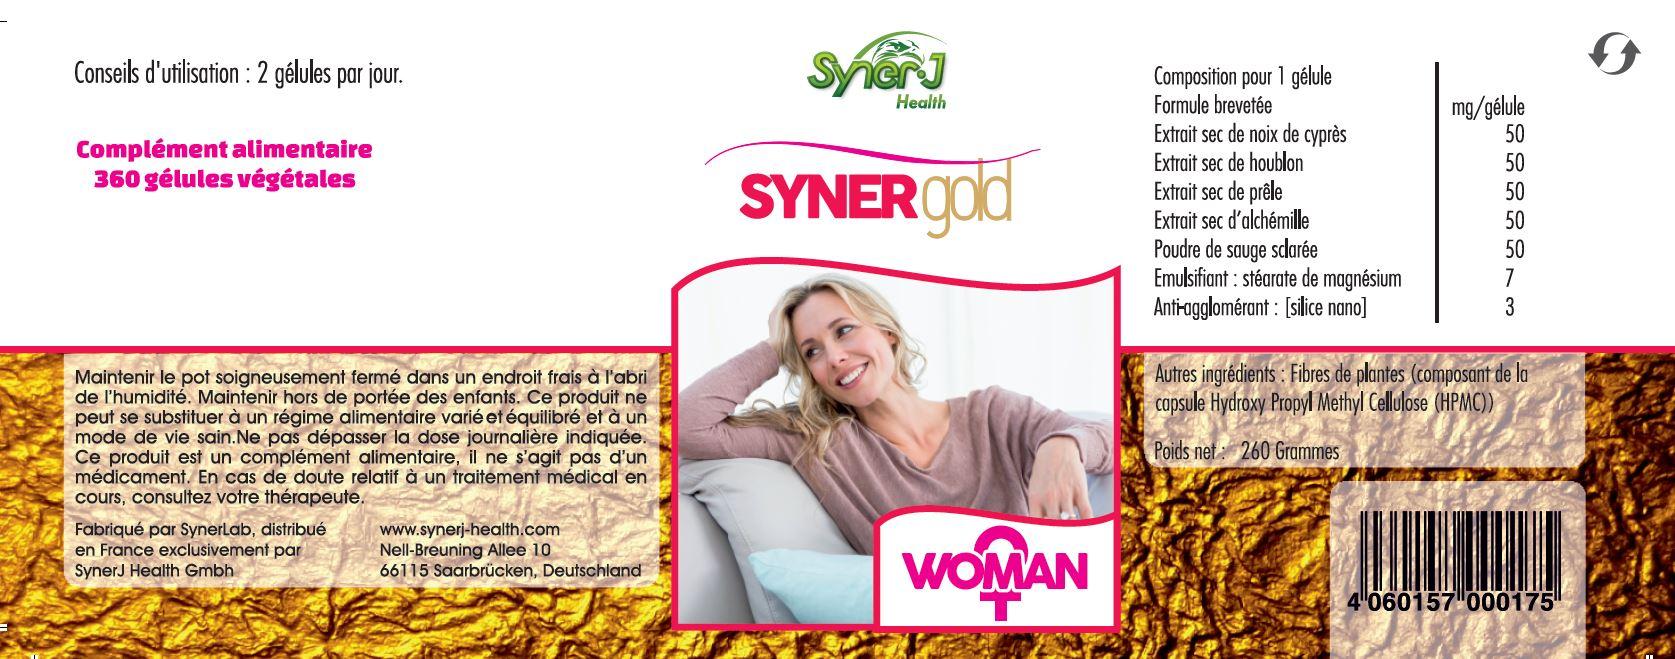 Synergold woman etiquette